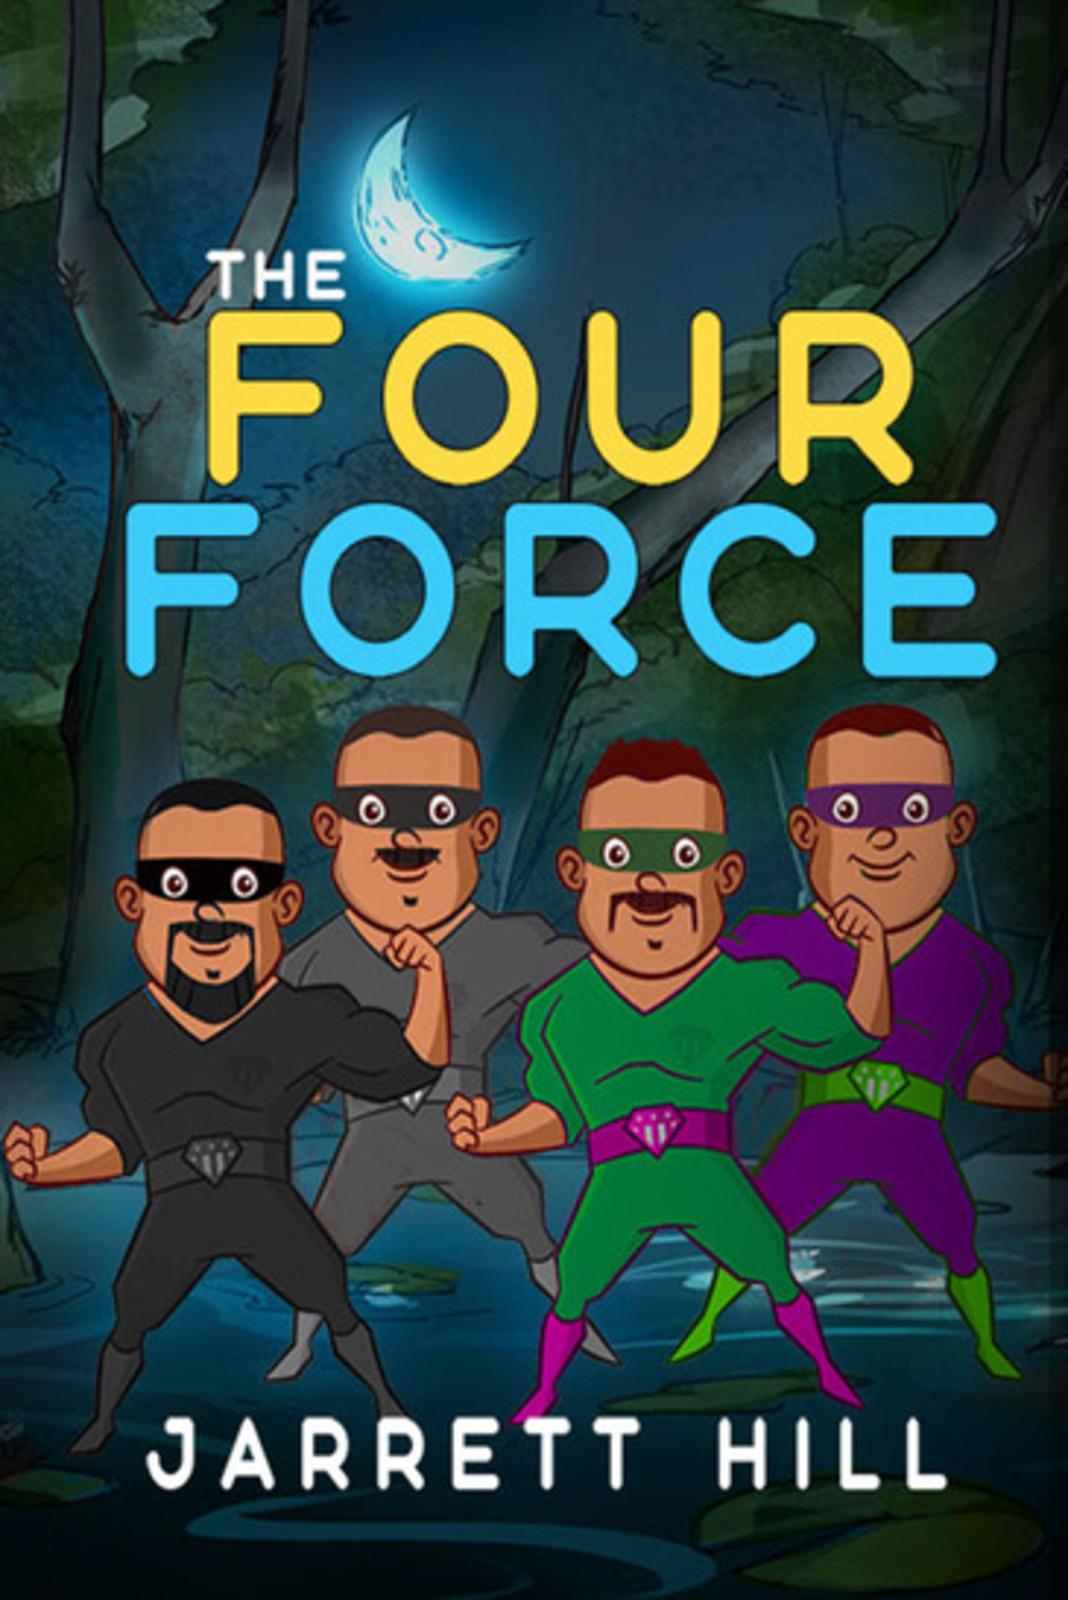 Author Jarrett Hill AKA JMoneyMakk Launches Newest Crime Thriller Action Book, The Four Force